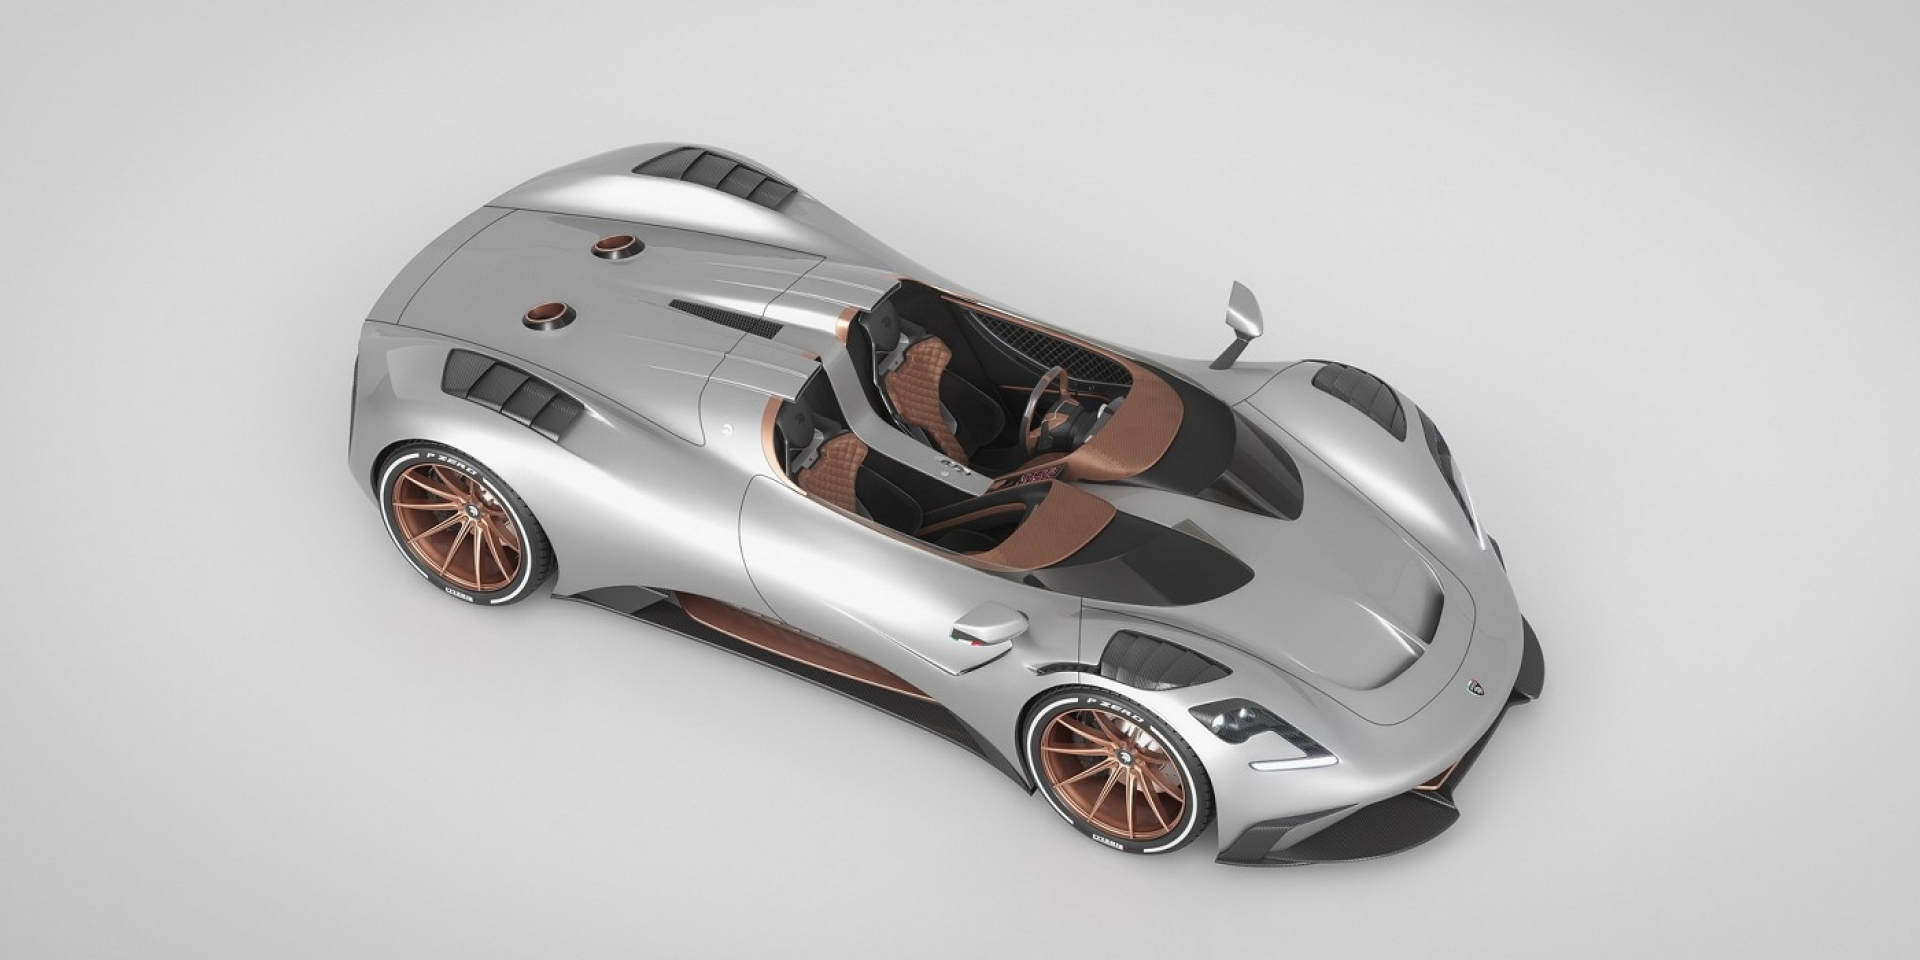 Corvette變裝成功,Ares Design限量推出S1 Project Spyder